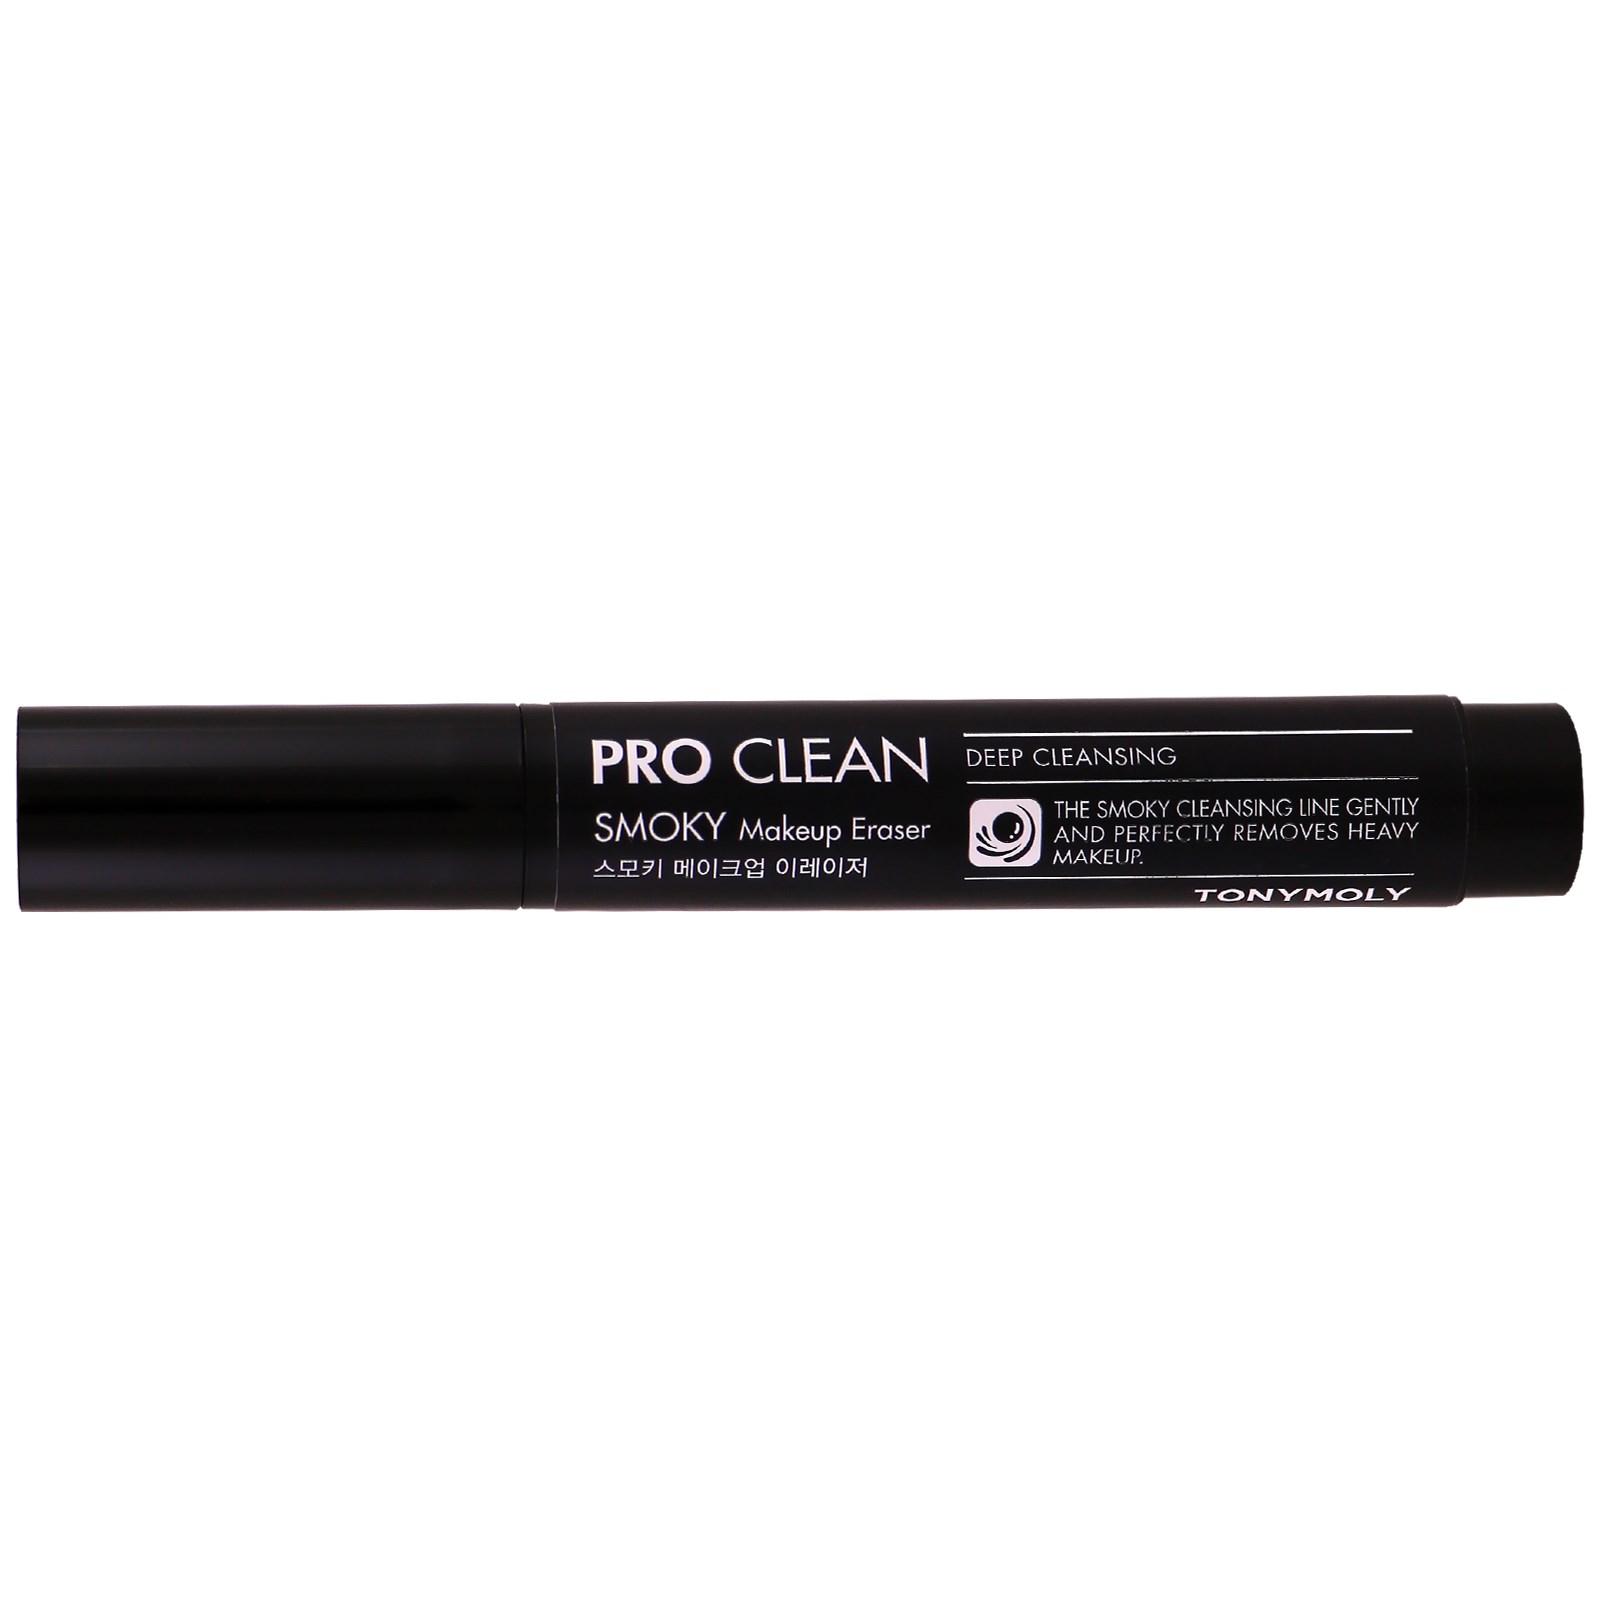 Tony Moly, Pro Clean, Удаление Smoky макияжа, 2 г